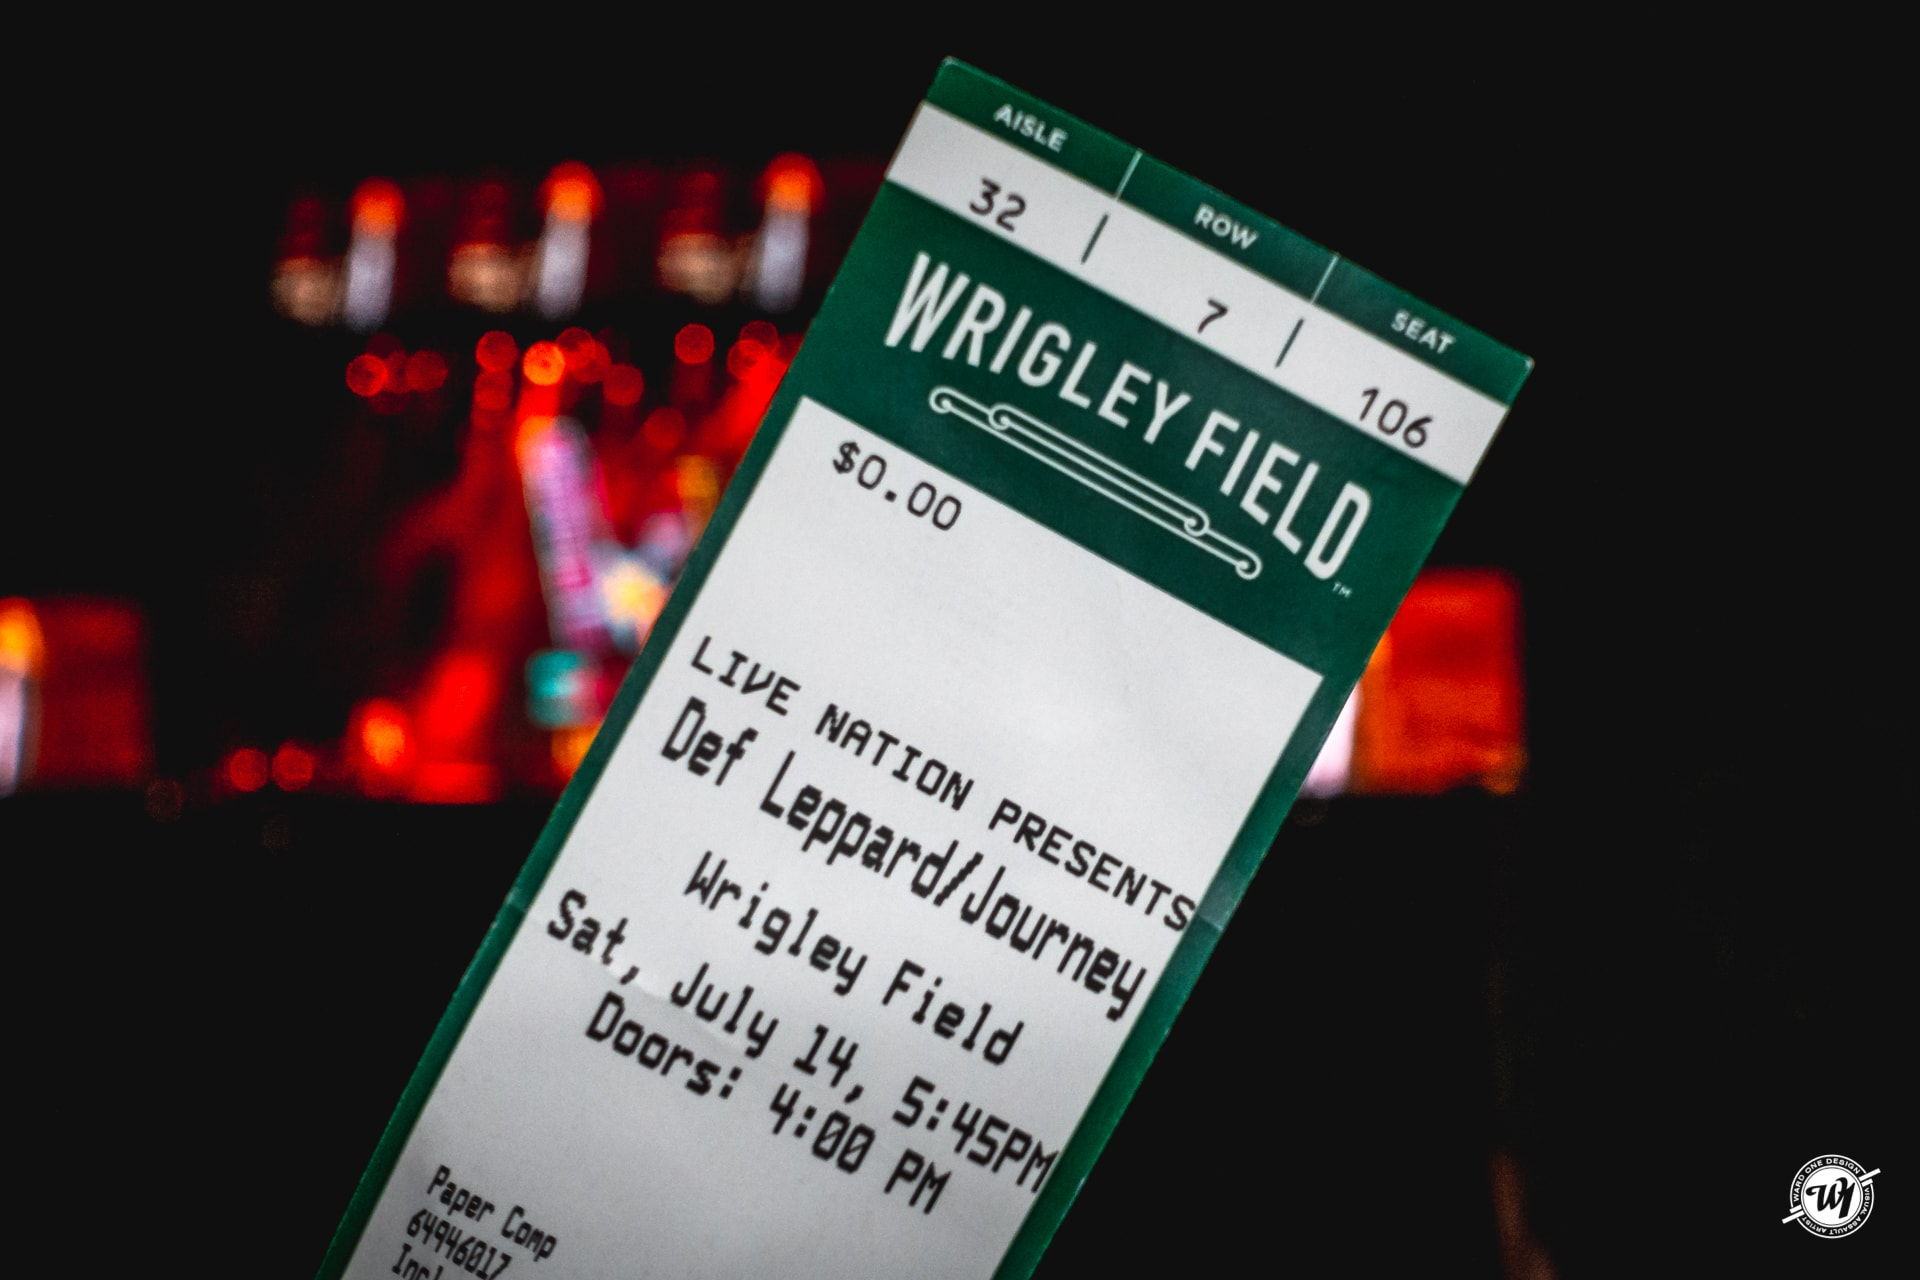 Def Leppard - Journey - Wrigley Field Chicago 2018